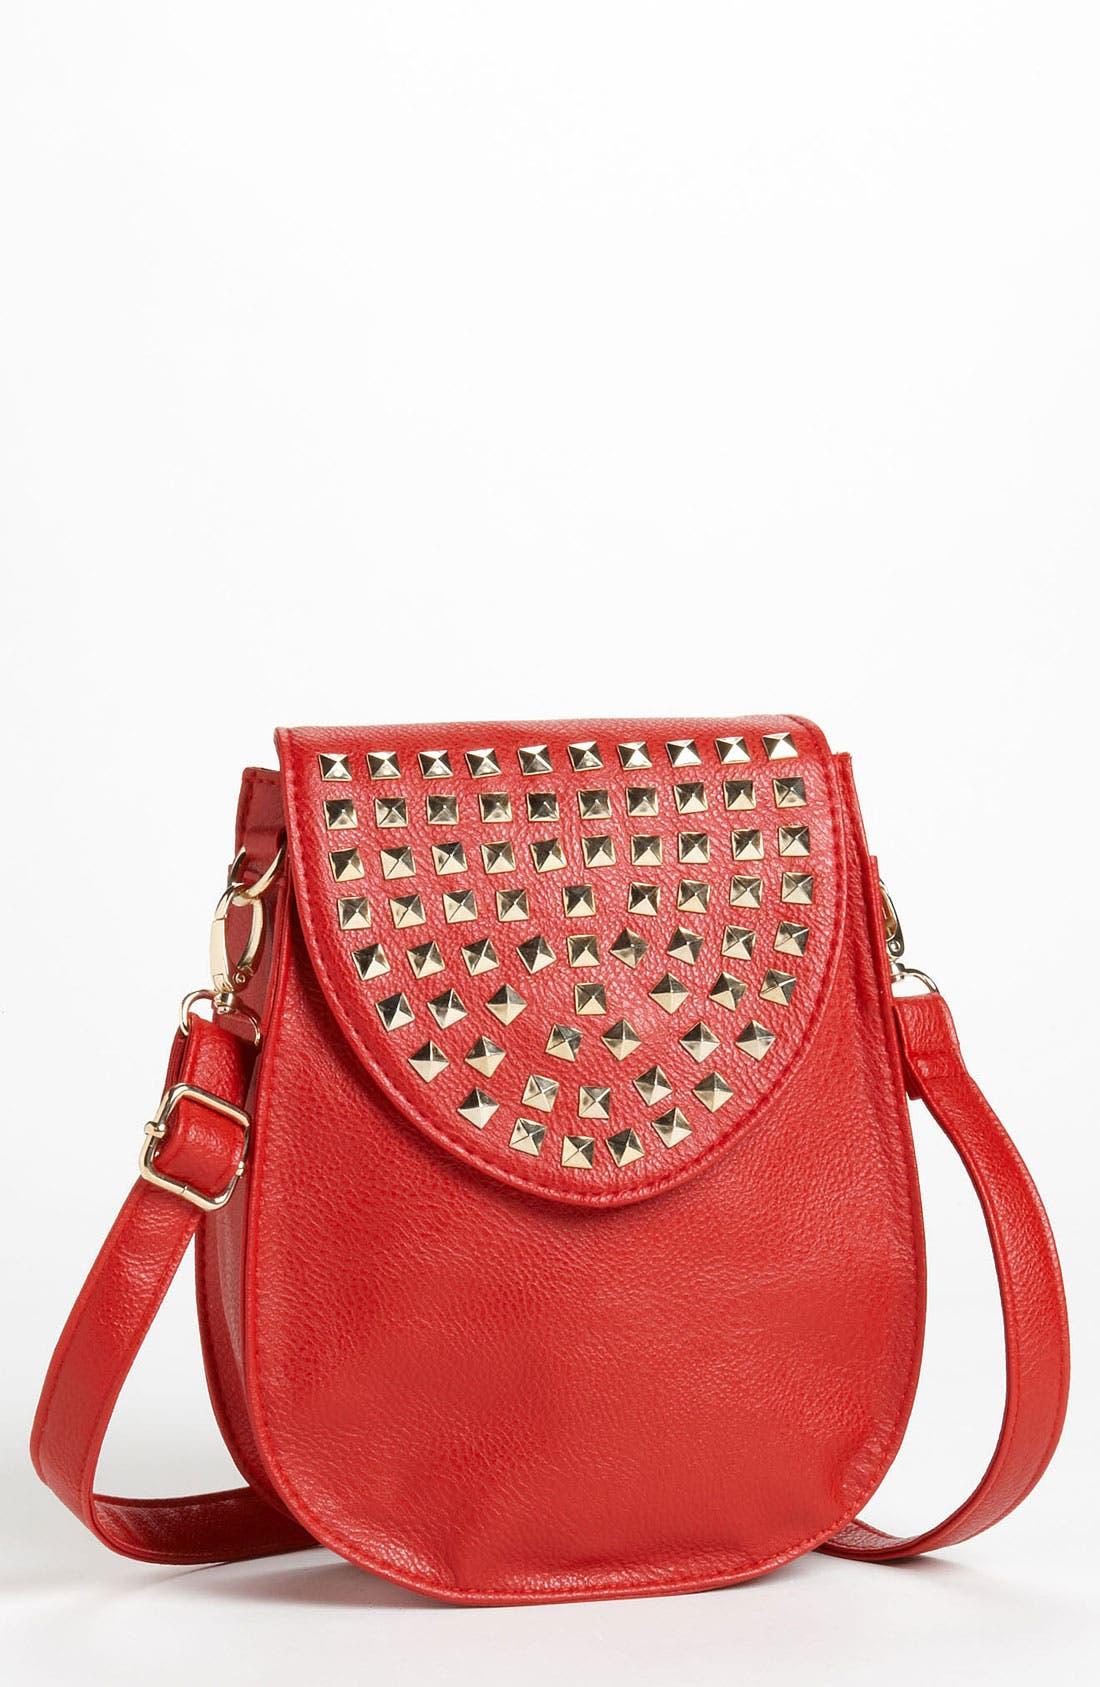 Alternate Image 1 Selected - Natasha Couture Studded Flap Crossbody Bag